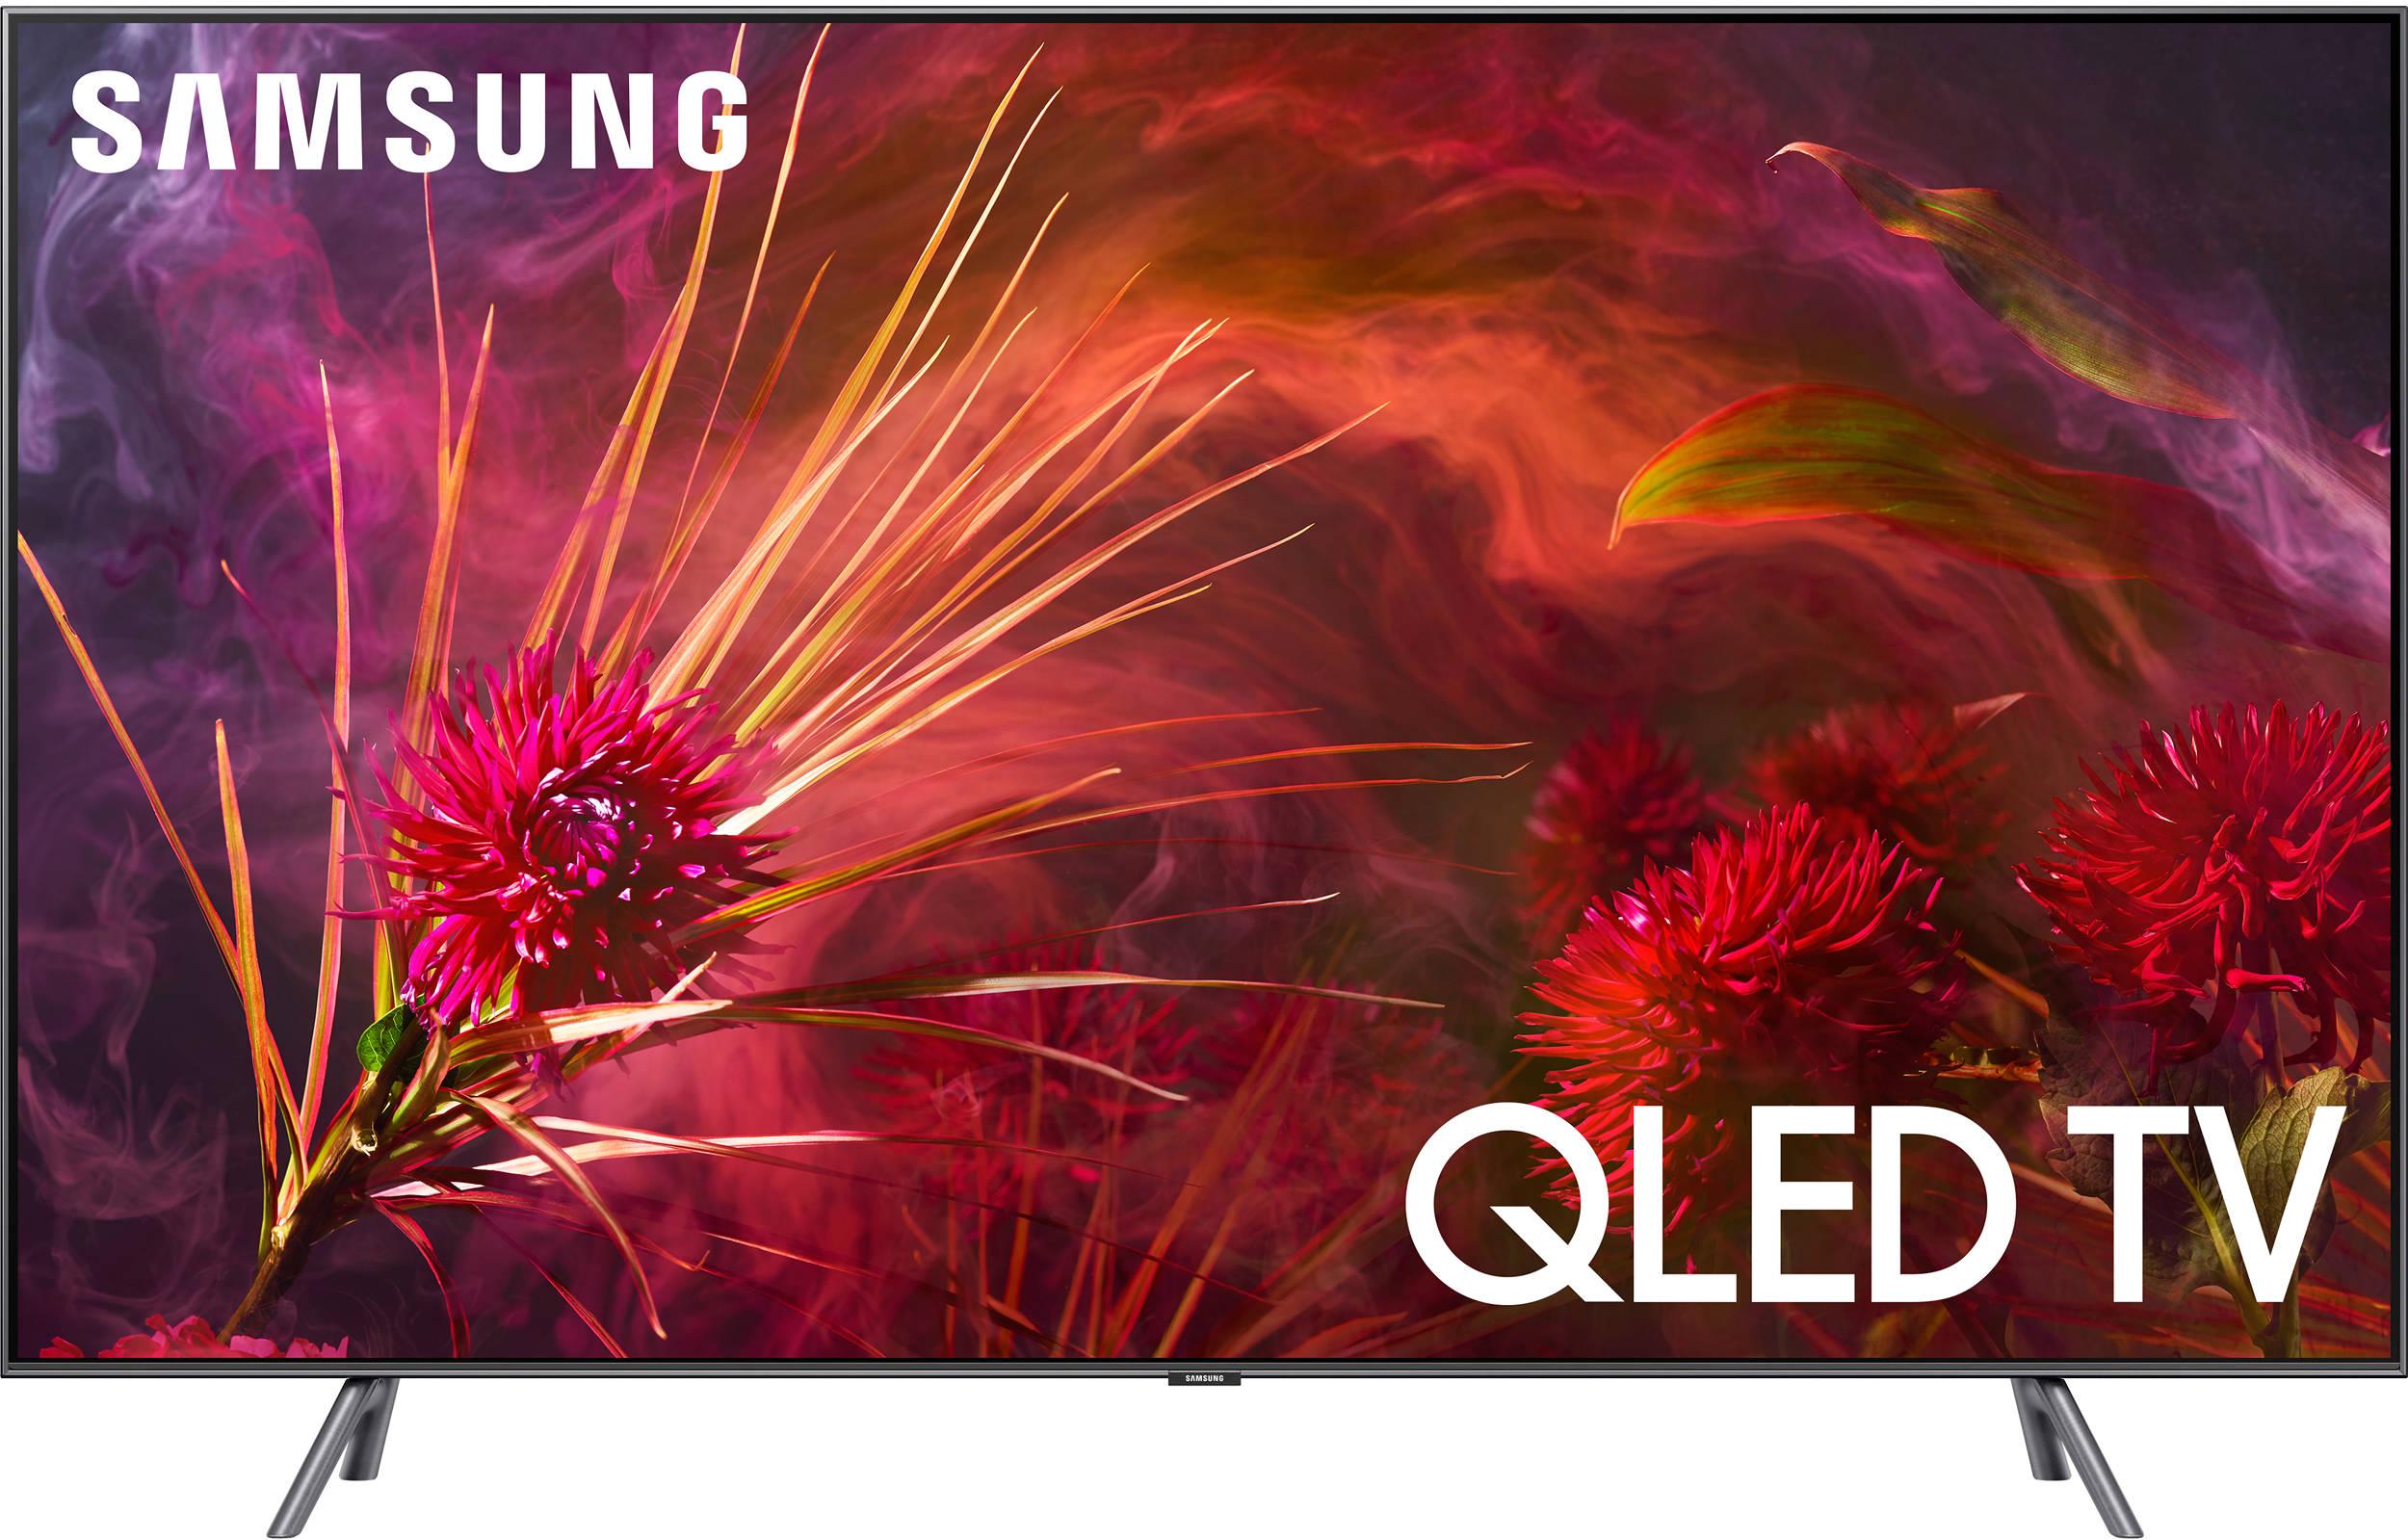 Samsung QN55Q8FN 55'' HDR UHD Smart QLED TV | lucaselectronics